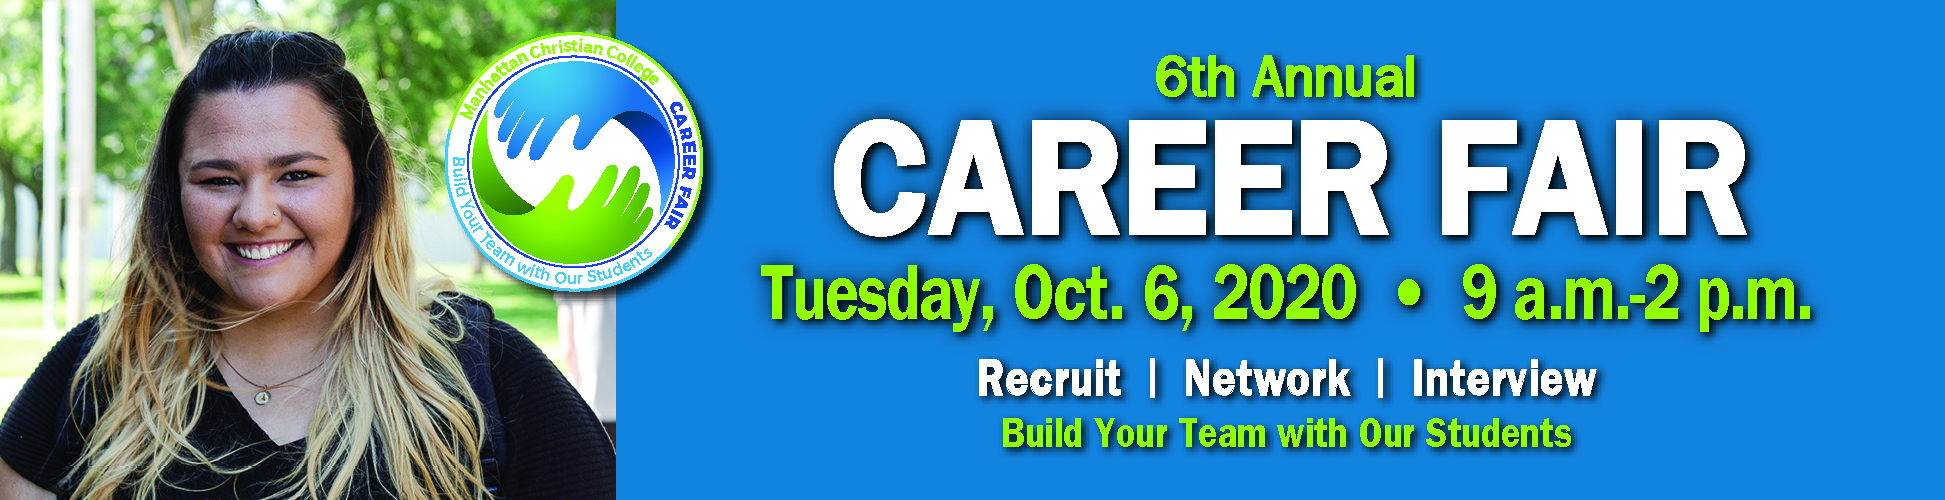 career fair small banner Oct 6 2020